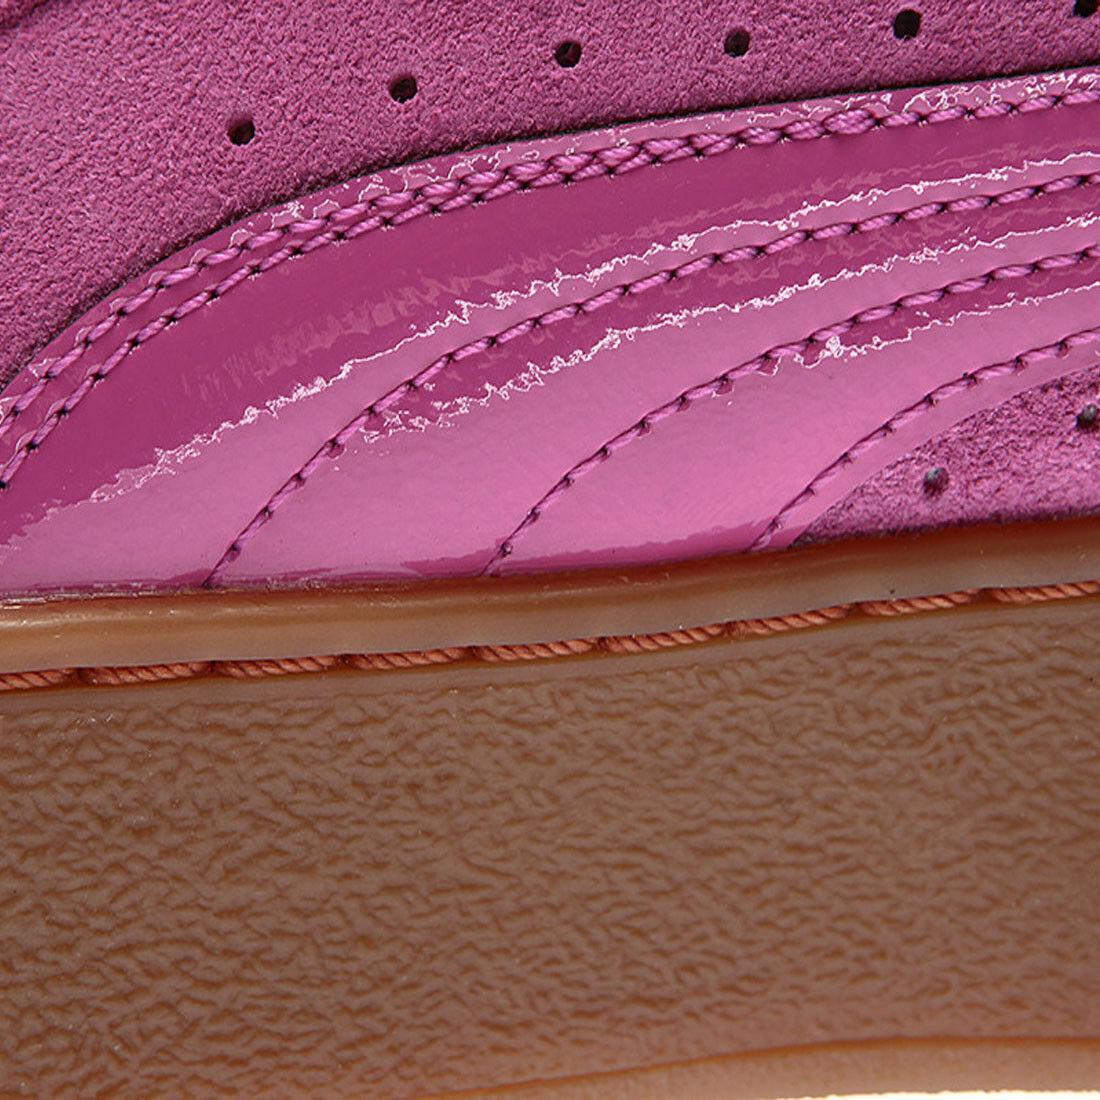 ee64cf86d Puma Vikky Platform Trainers Rose Violet Pink Womens Suede Lace Up Shoes